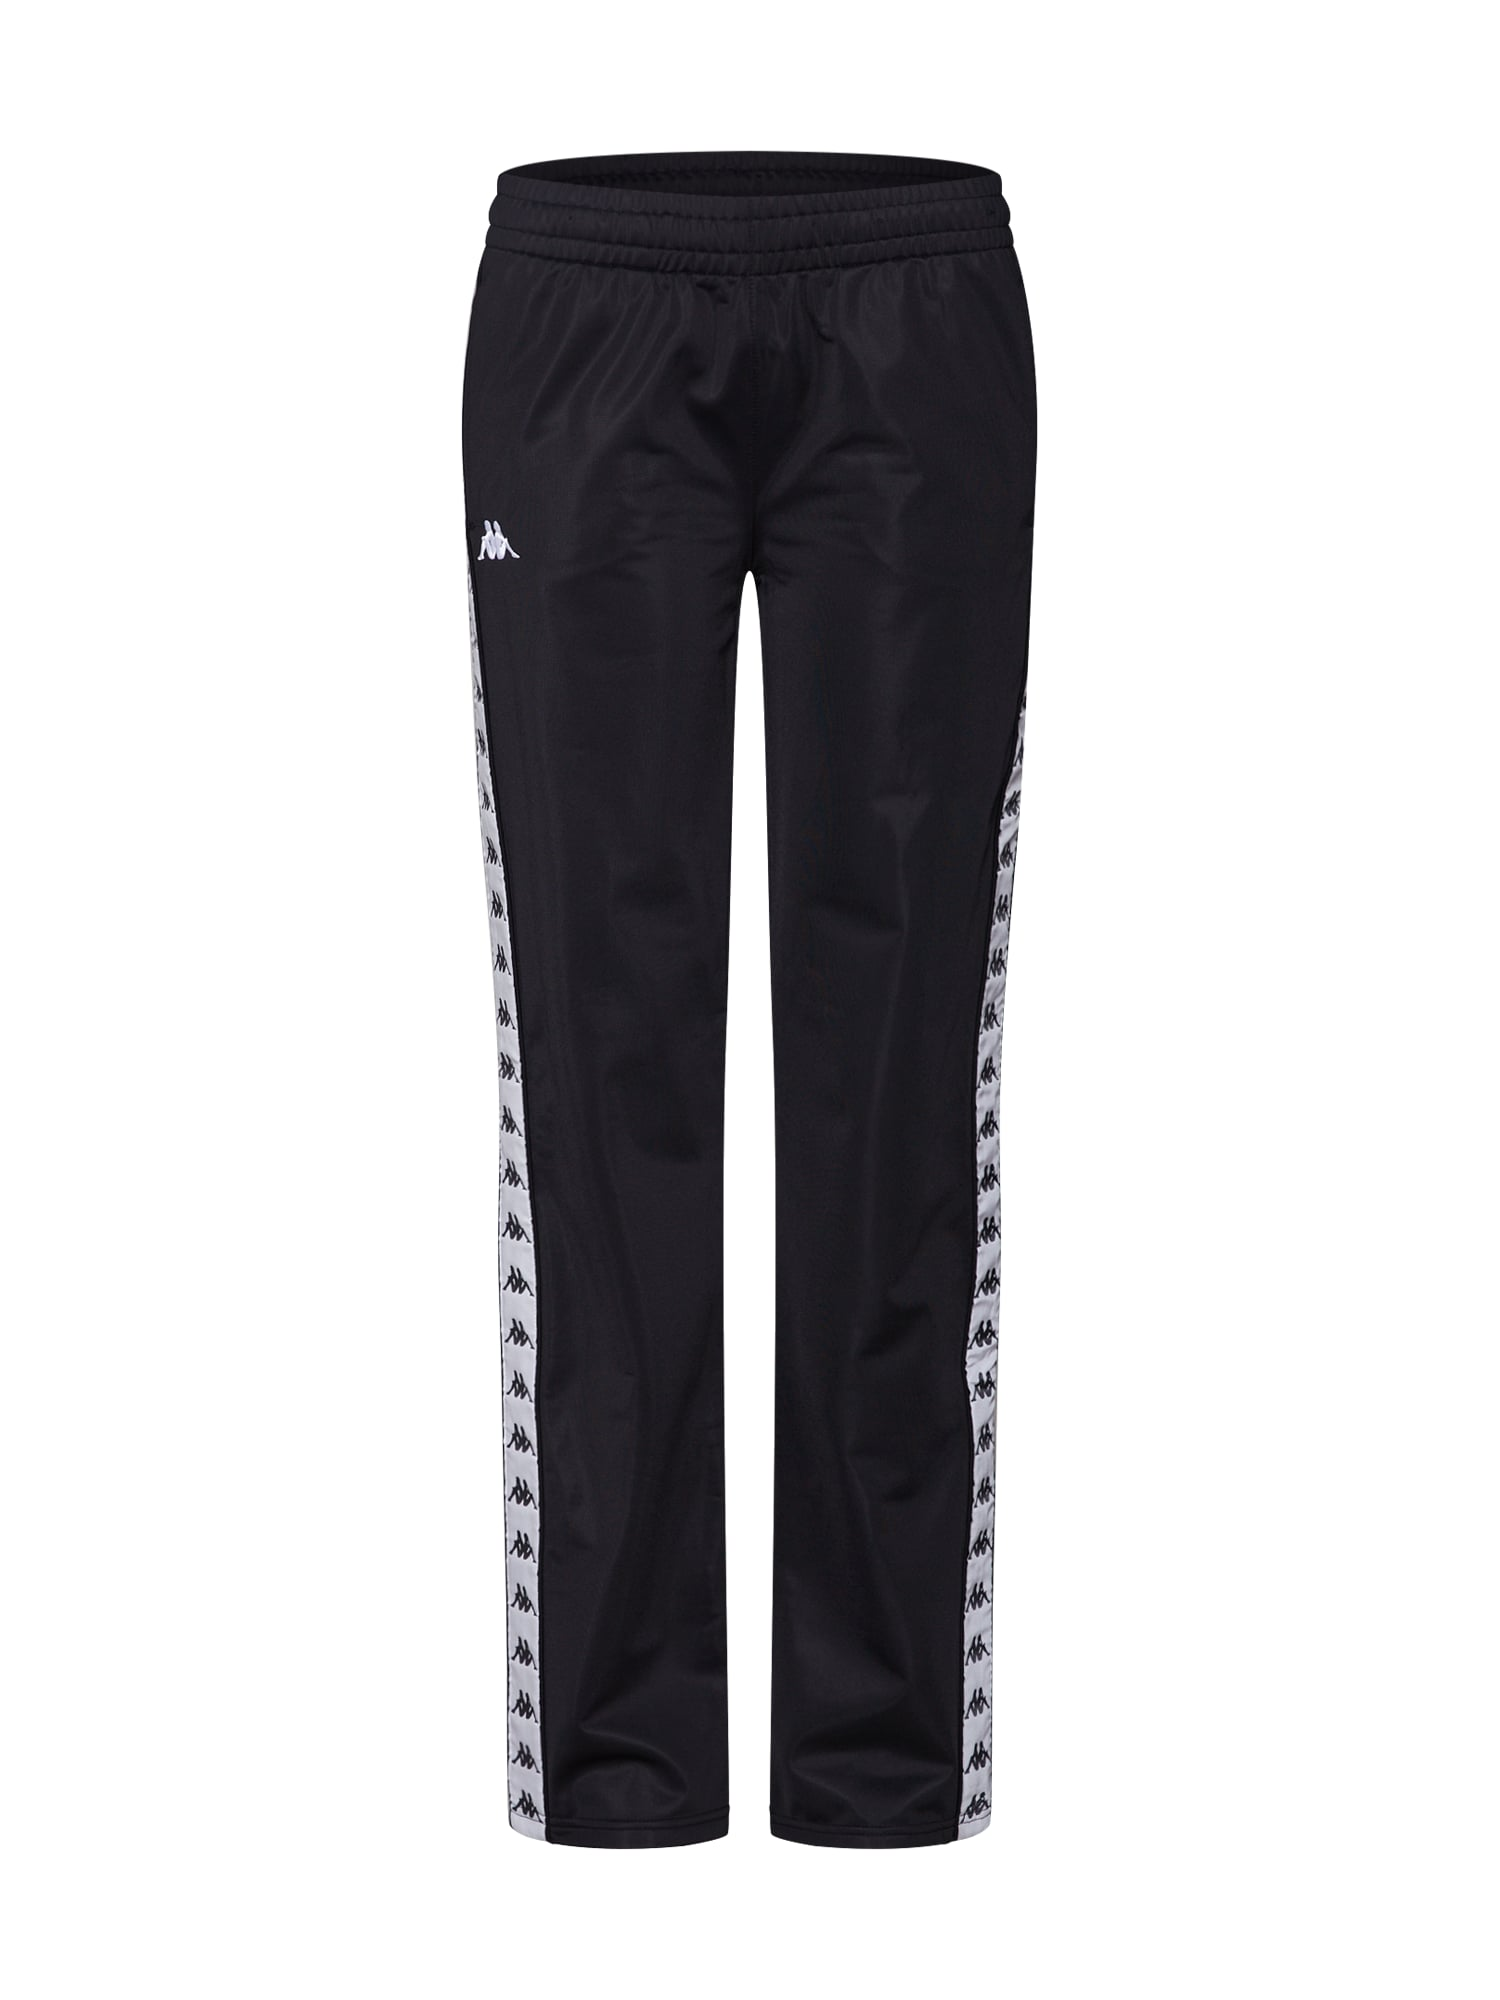 Kalhoty Elvira černá bílá KAPPA